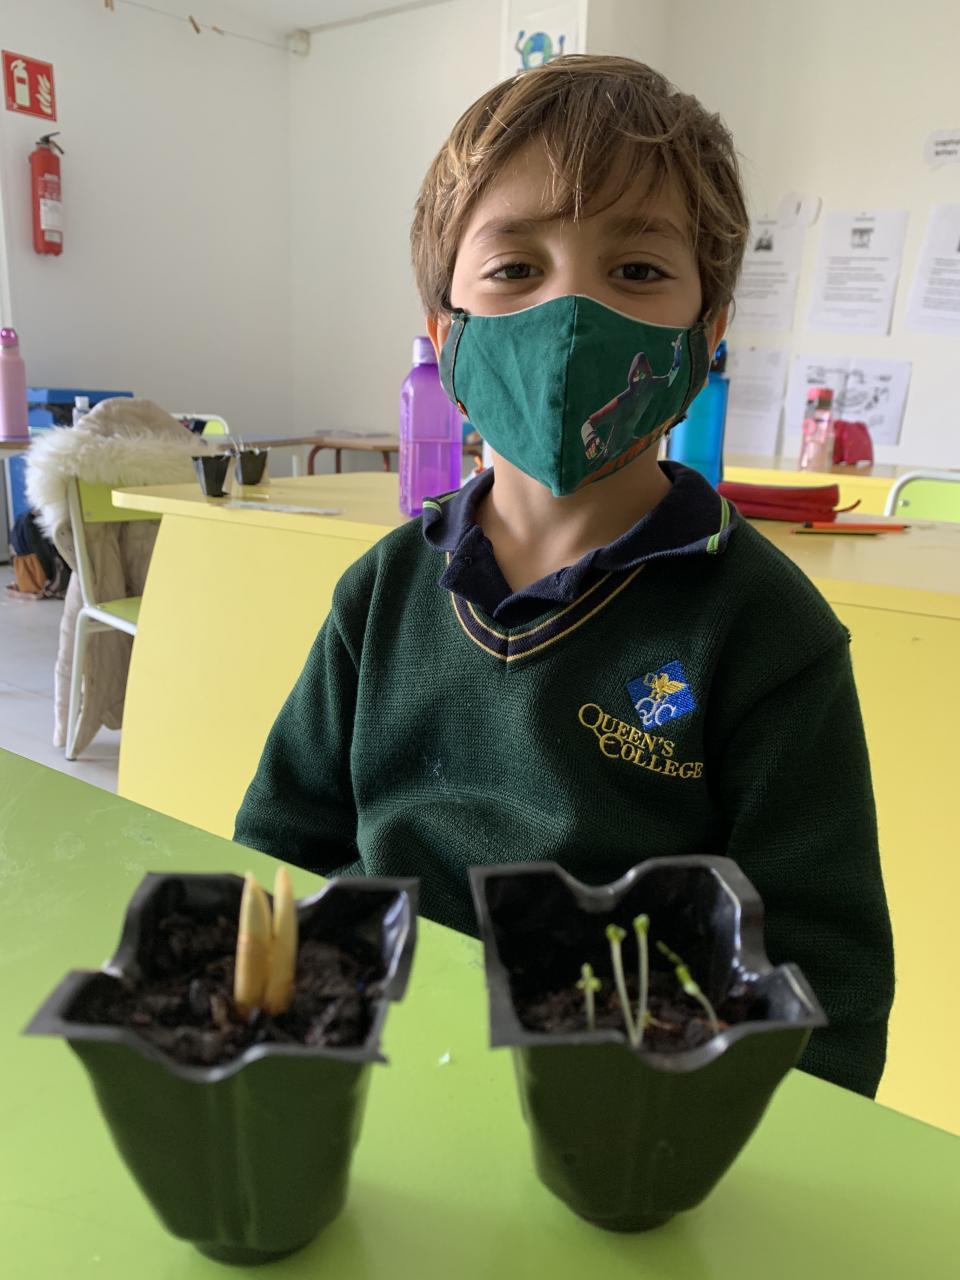 A school garden offers opportunities to teach life skills